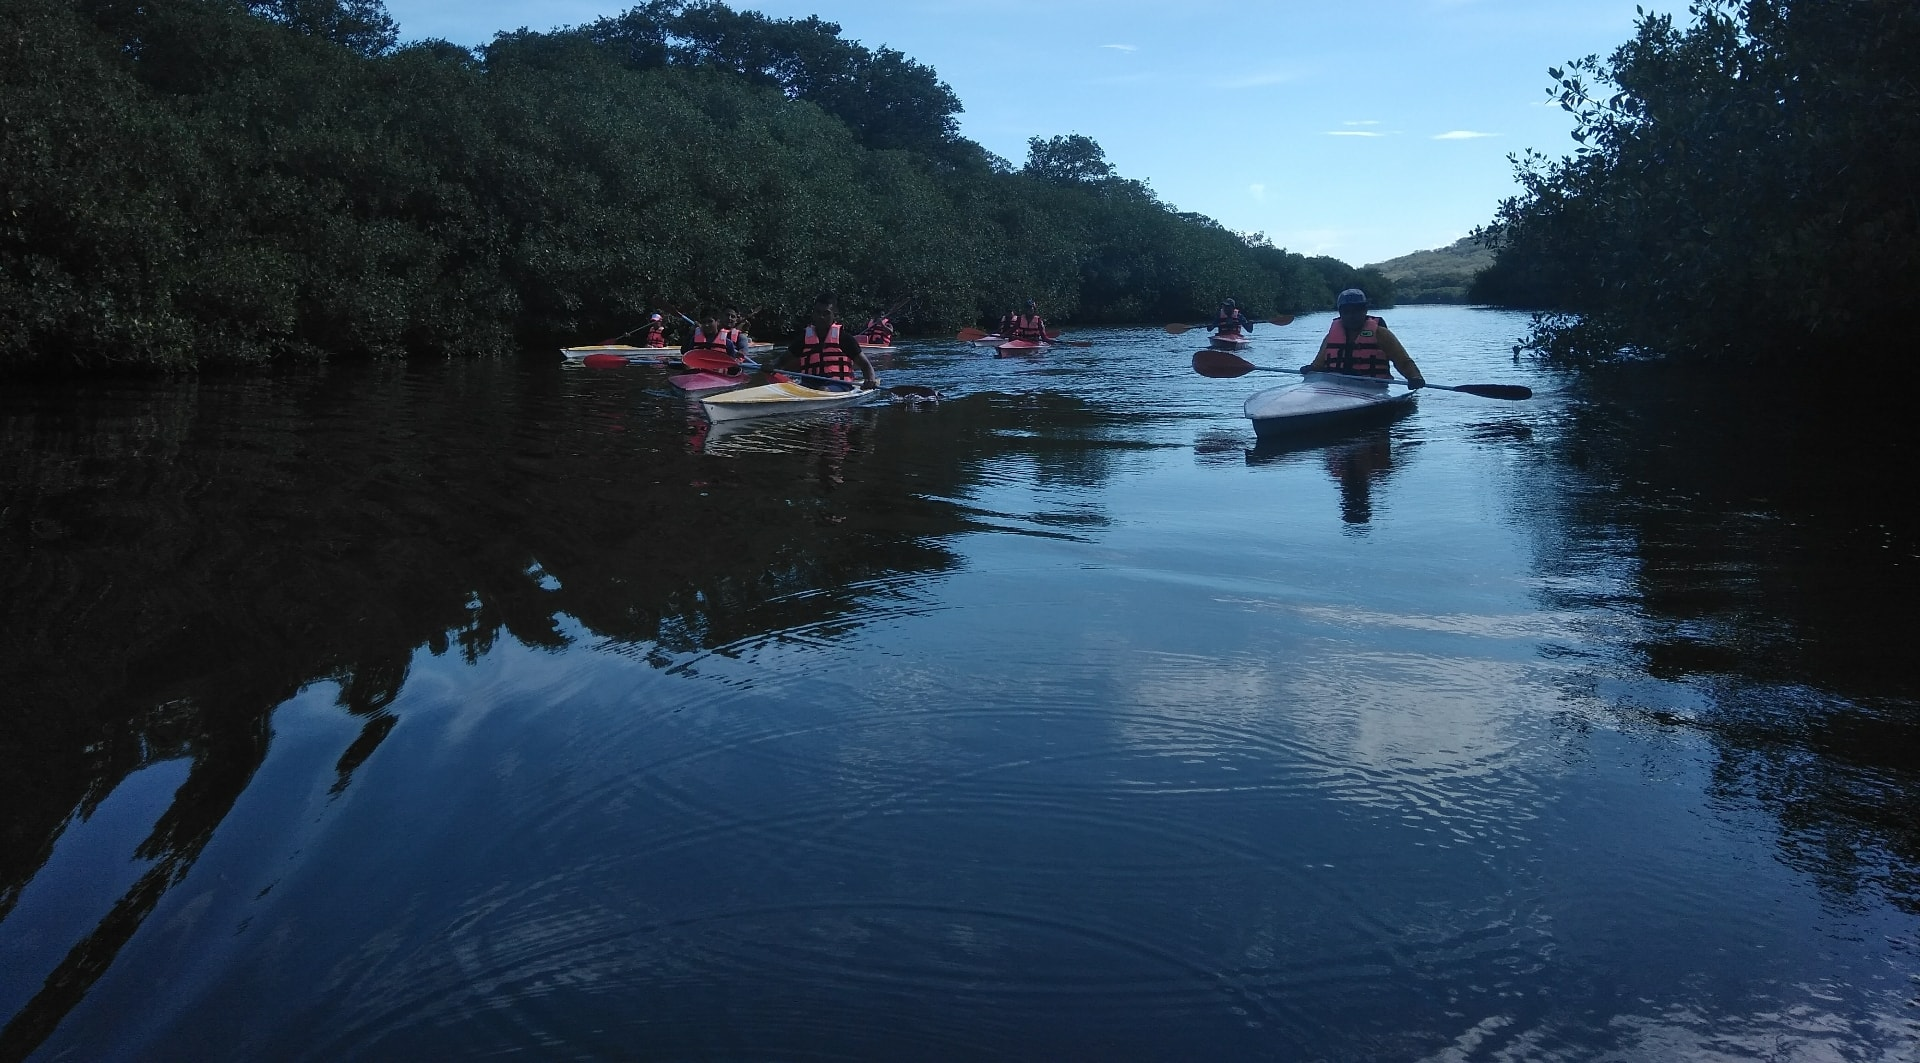 Humedales en La Mancha, Veracruz